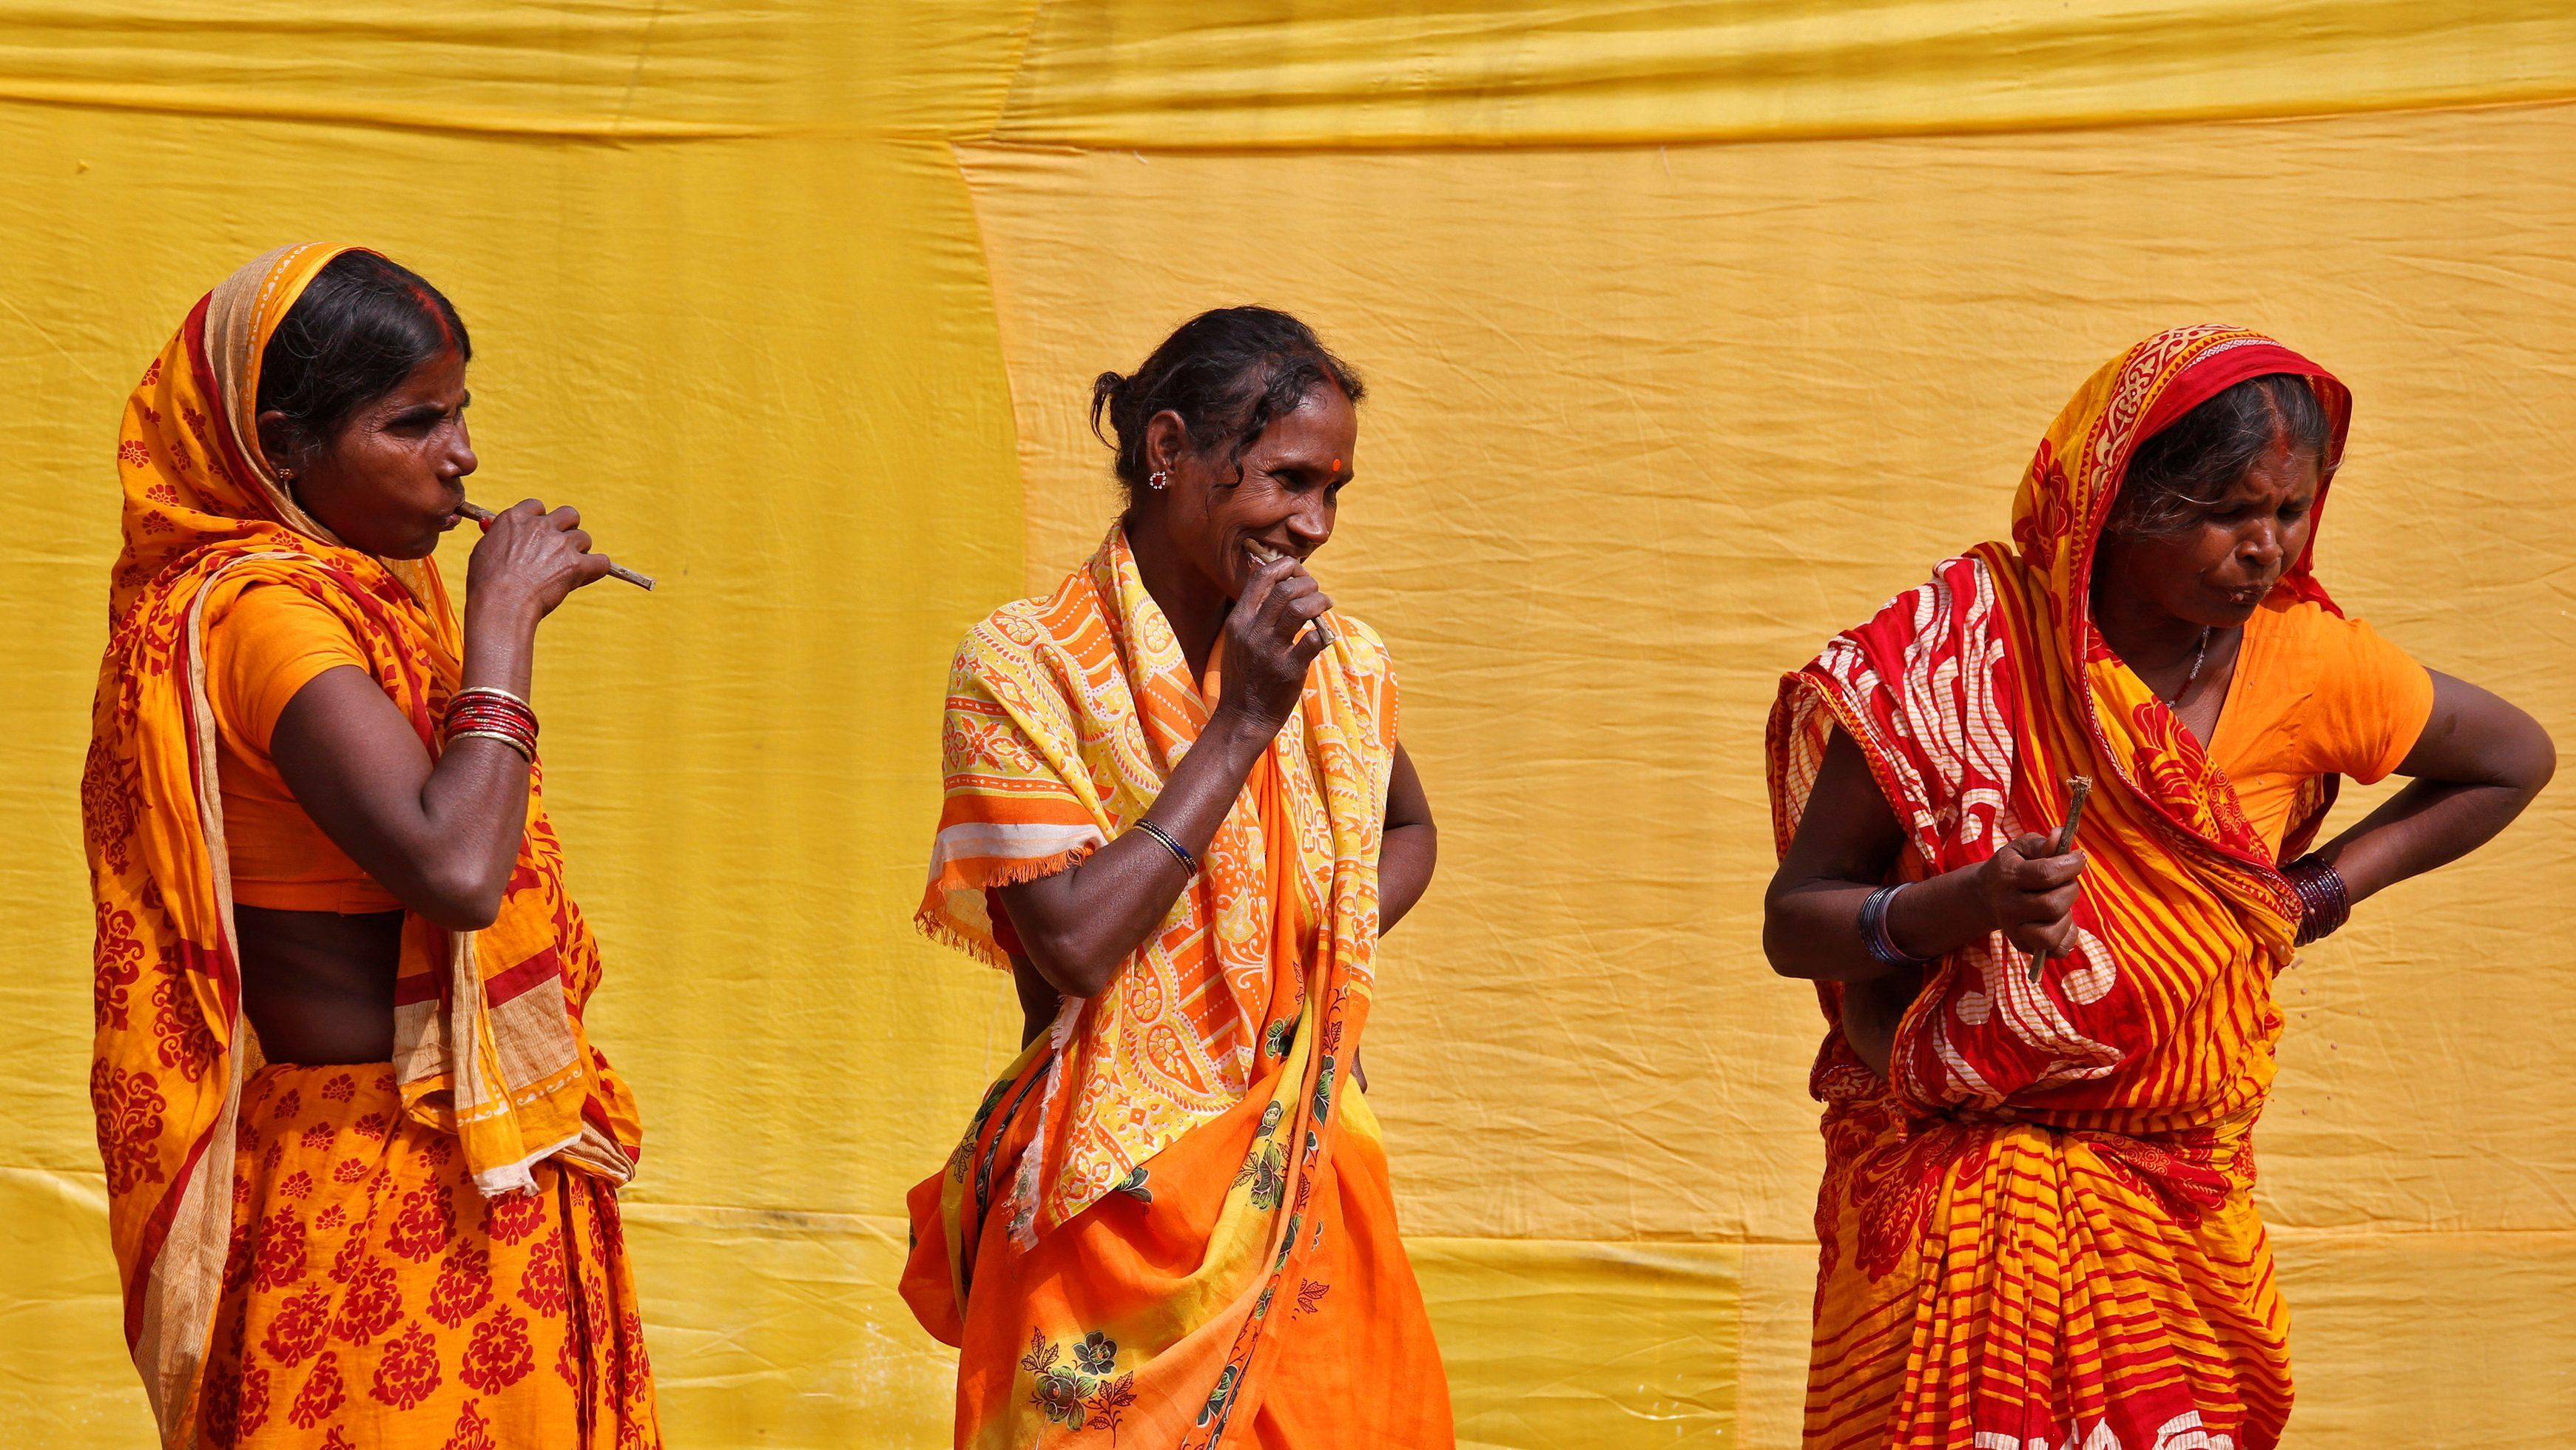 India-oral care